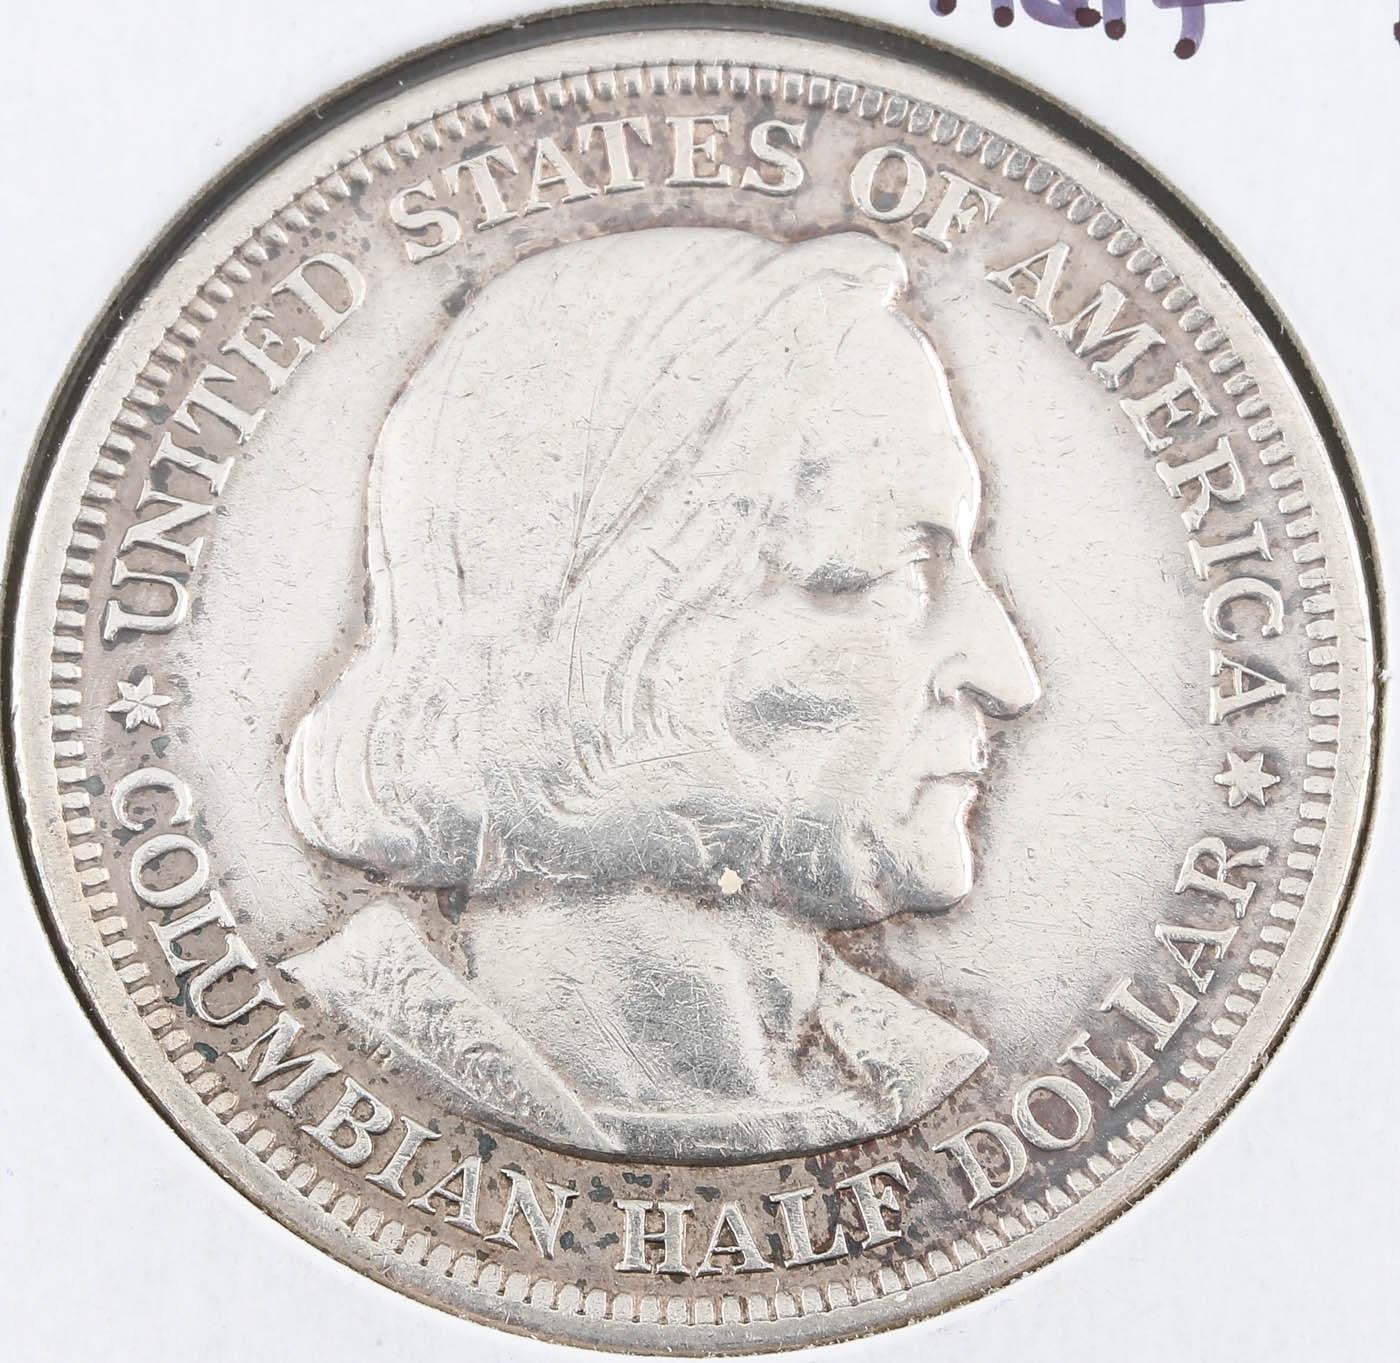 1893 Columbian Exposition Silver Half Dollar